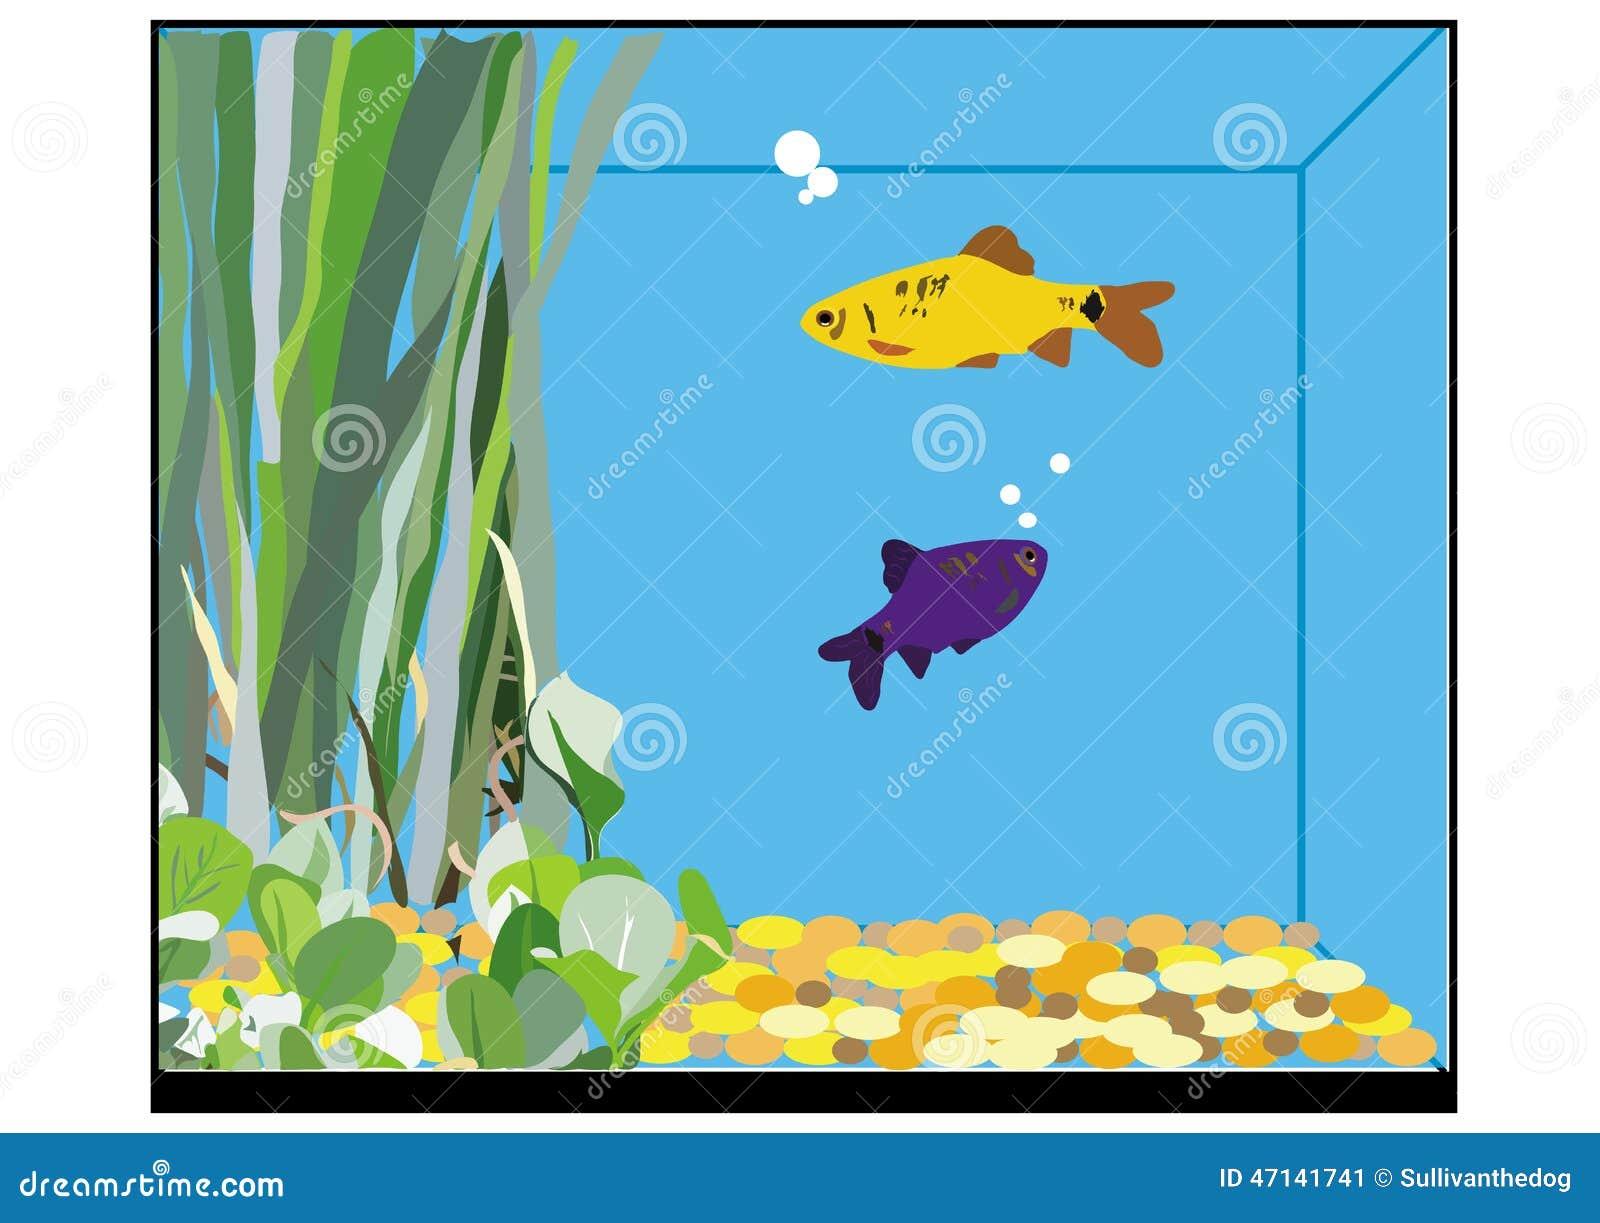 Fish tank clipart - A Fish Tank Stock Image